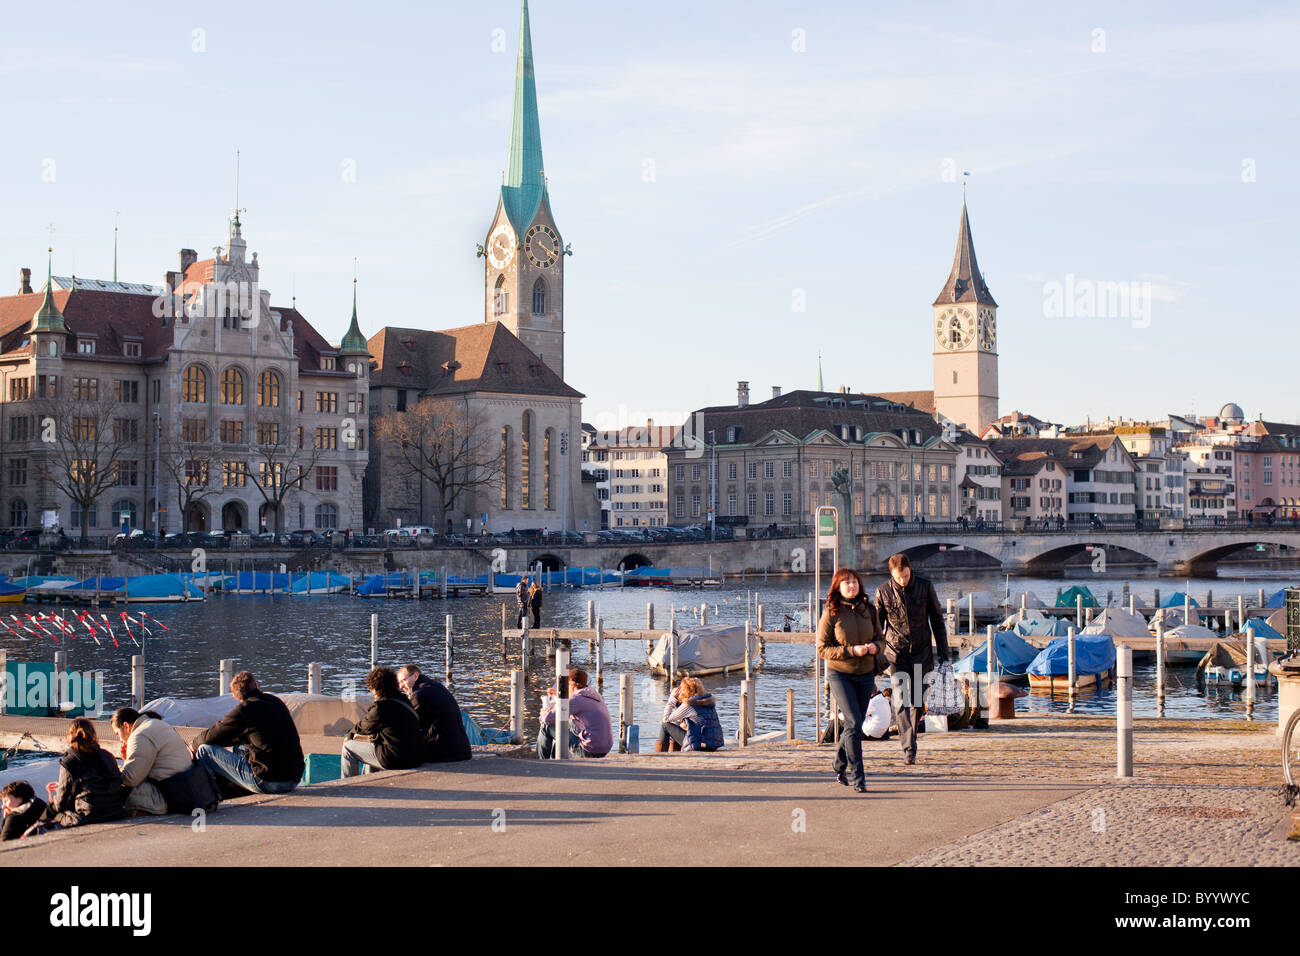 people enjoying weather, waterfront, Limmat River, Zürich, Switzerland - Stock Image